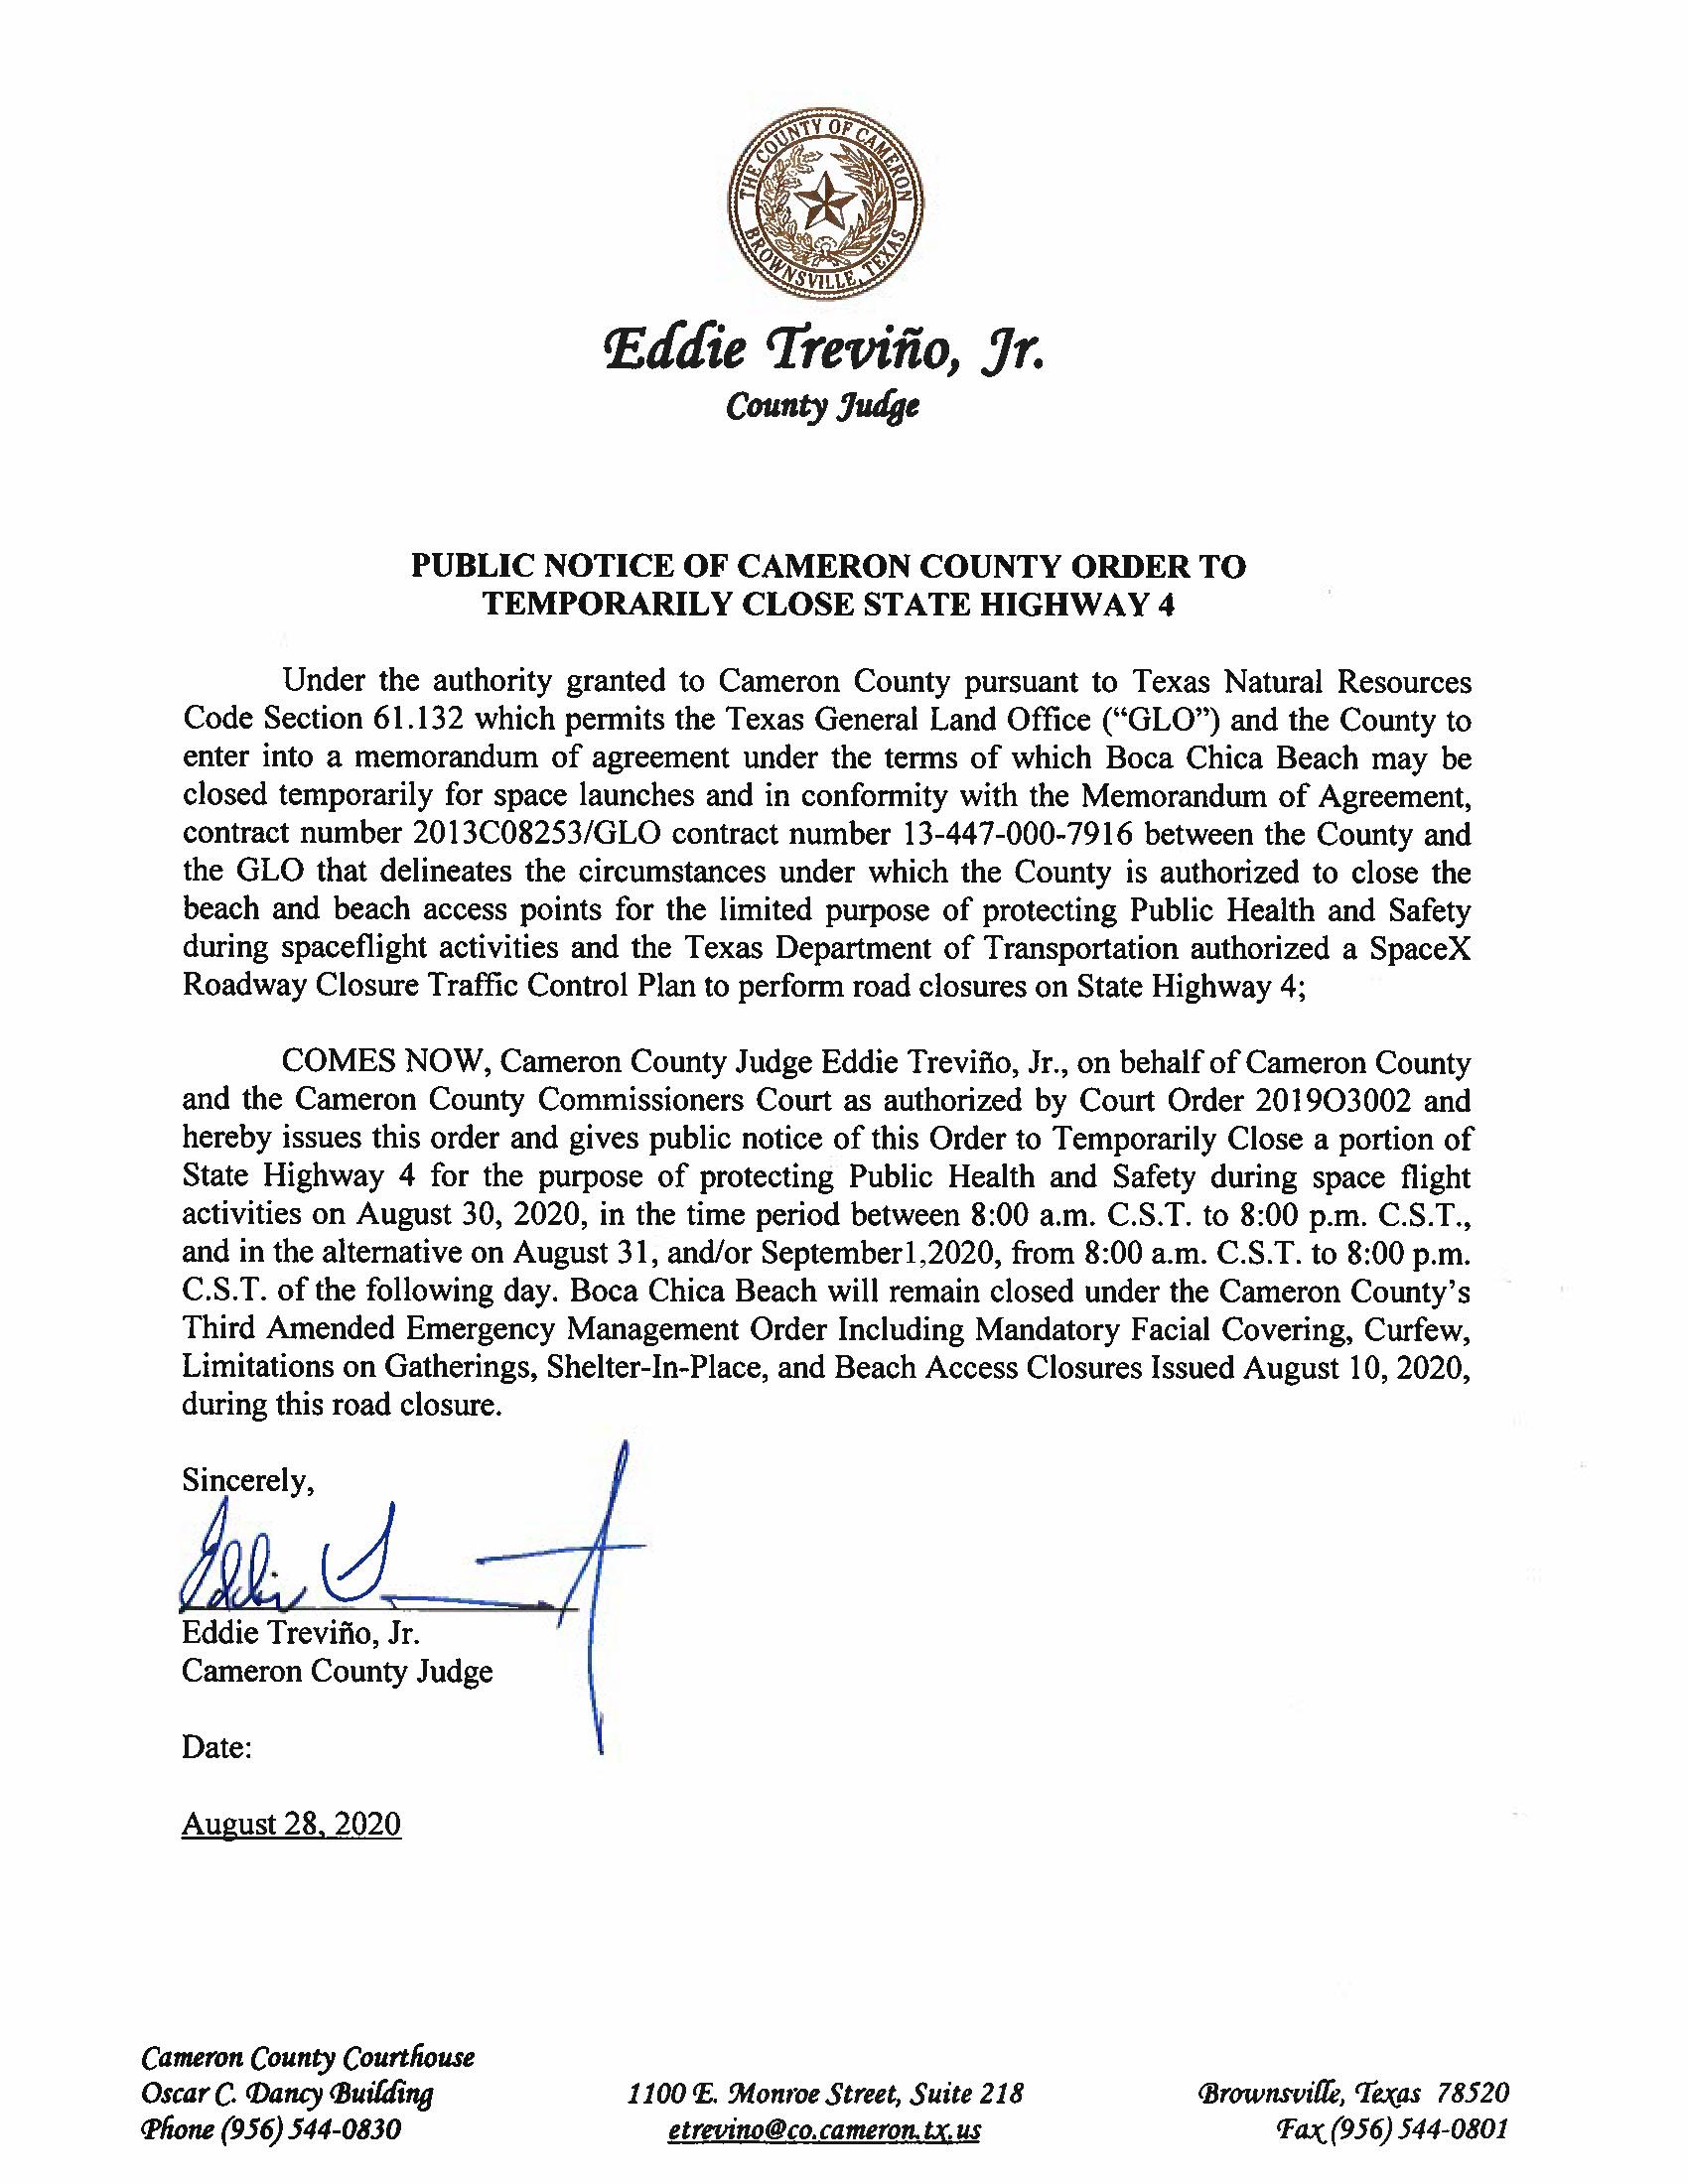 PUBLIC NOTICE OF CAMERON COUNTY ORDER TO TEMP. ROAD CLOSURE. 08.30.20 Page 1